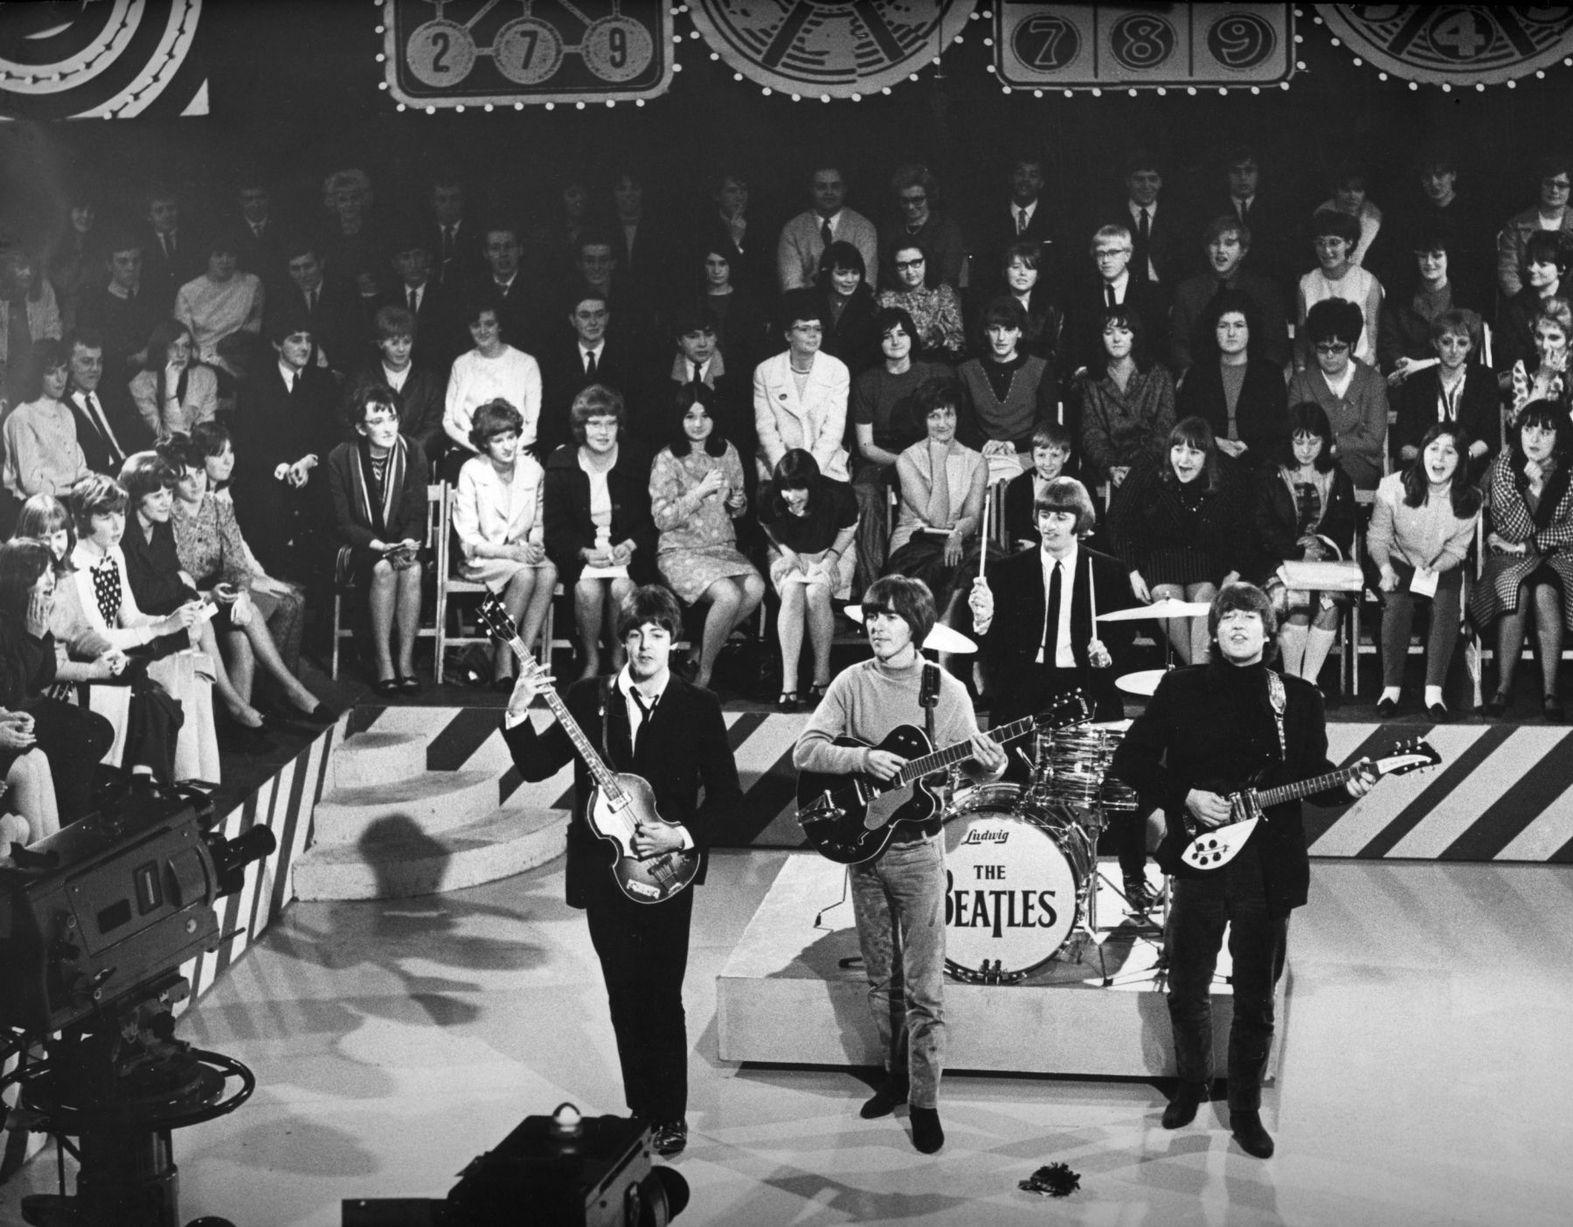 The Beatles in Birmingham | Beatles Archive